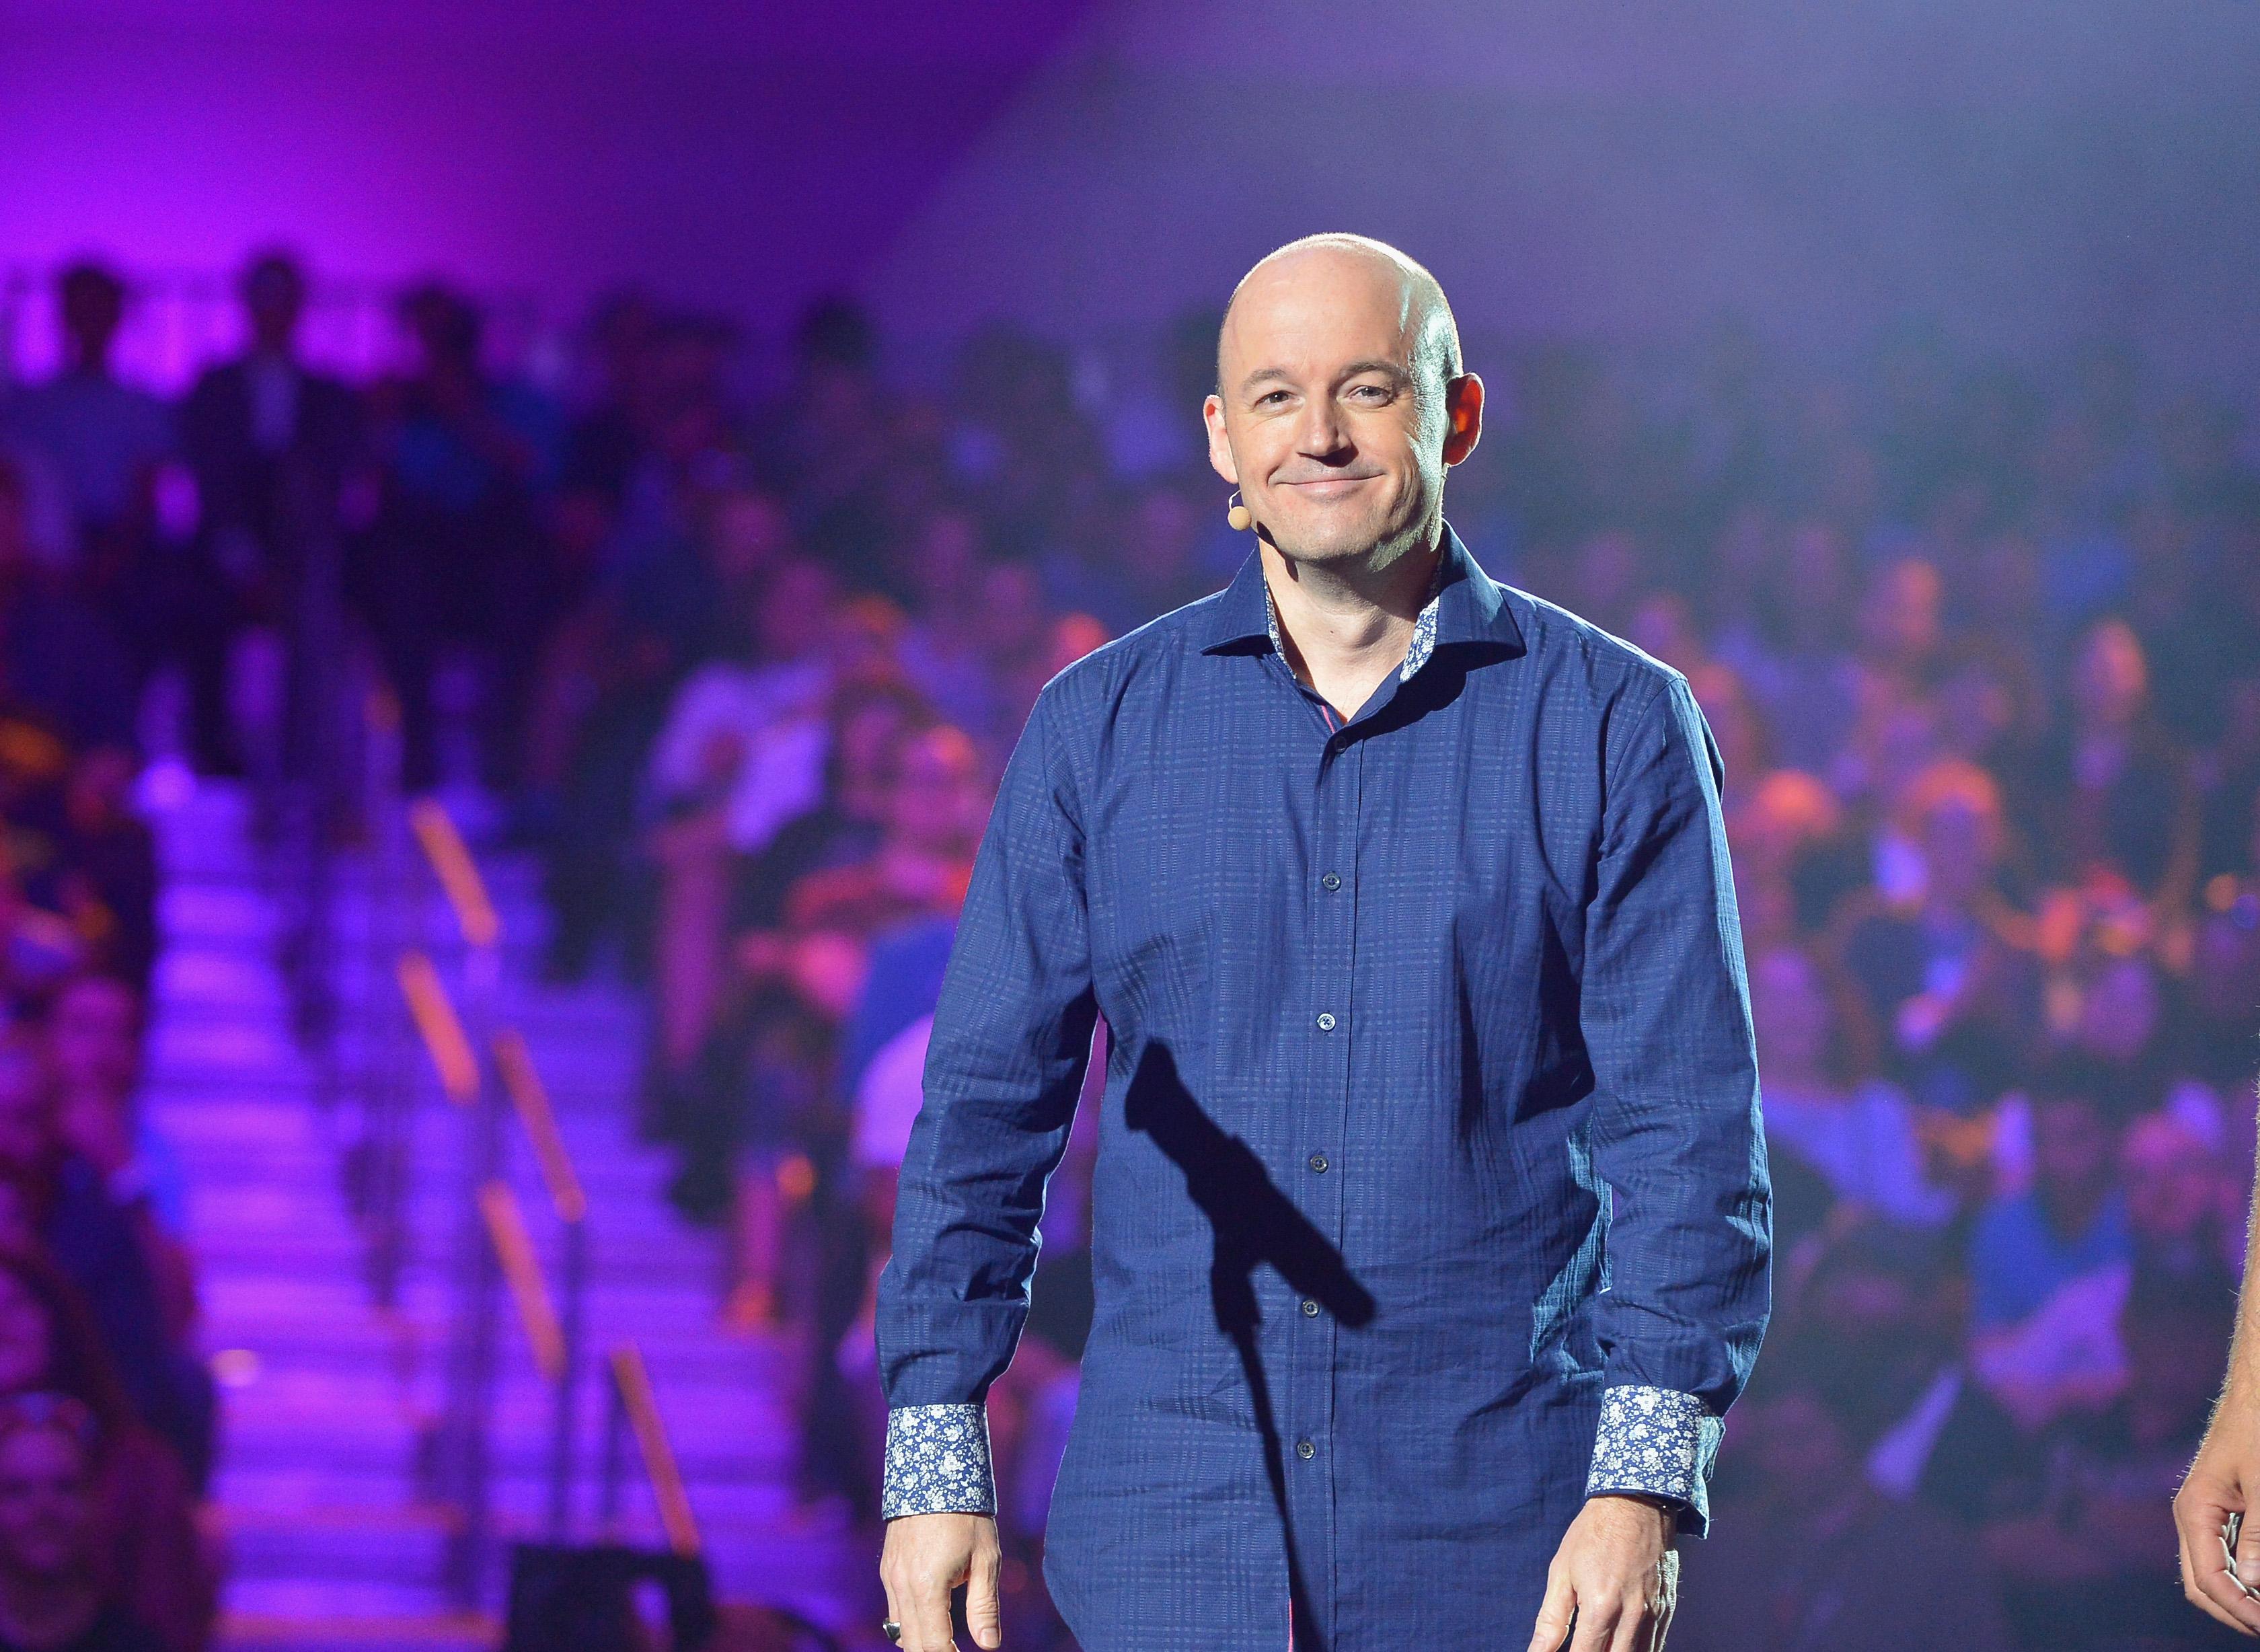 Tim Willits presents 'Rage 2' onstage at Bethesda Softworks' E3 2019 Showcase